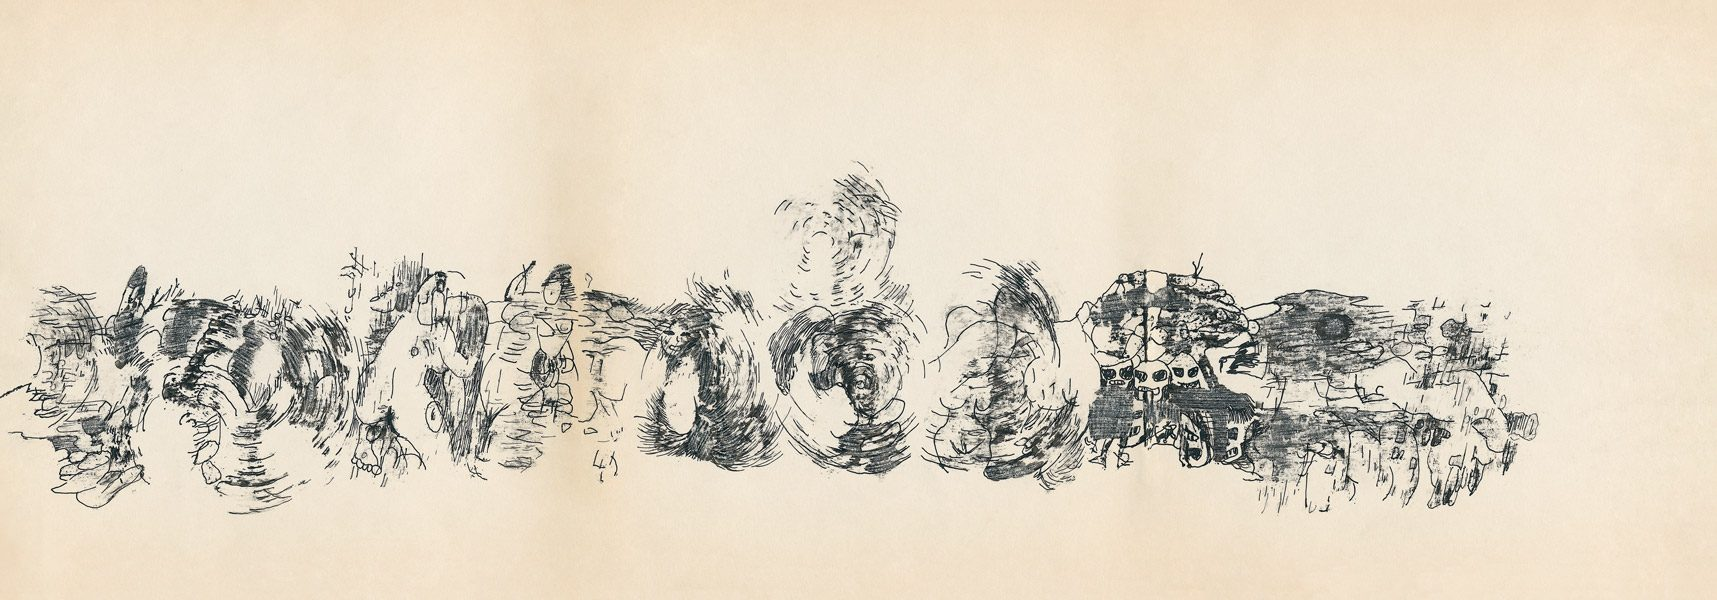 "LEBADANG, ""Genesis_36_37_38"", circa 1960, encre de Chine sur papier, 16.8 x 16.3 cm. © Myshu Lebadang, Paris, France."